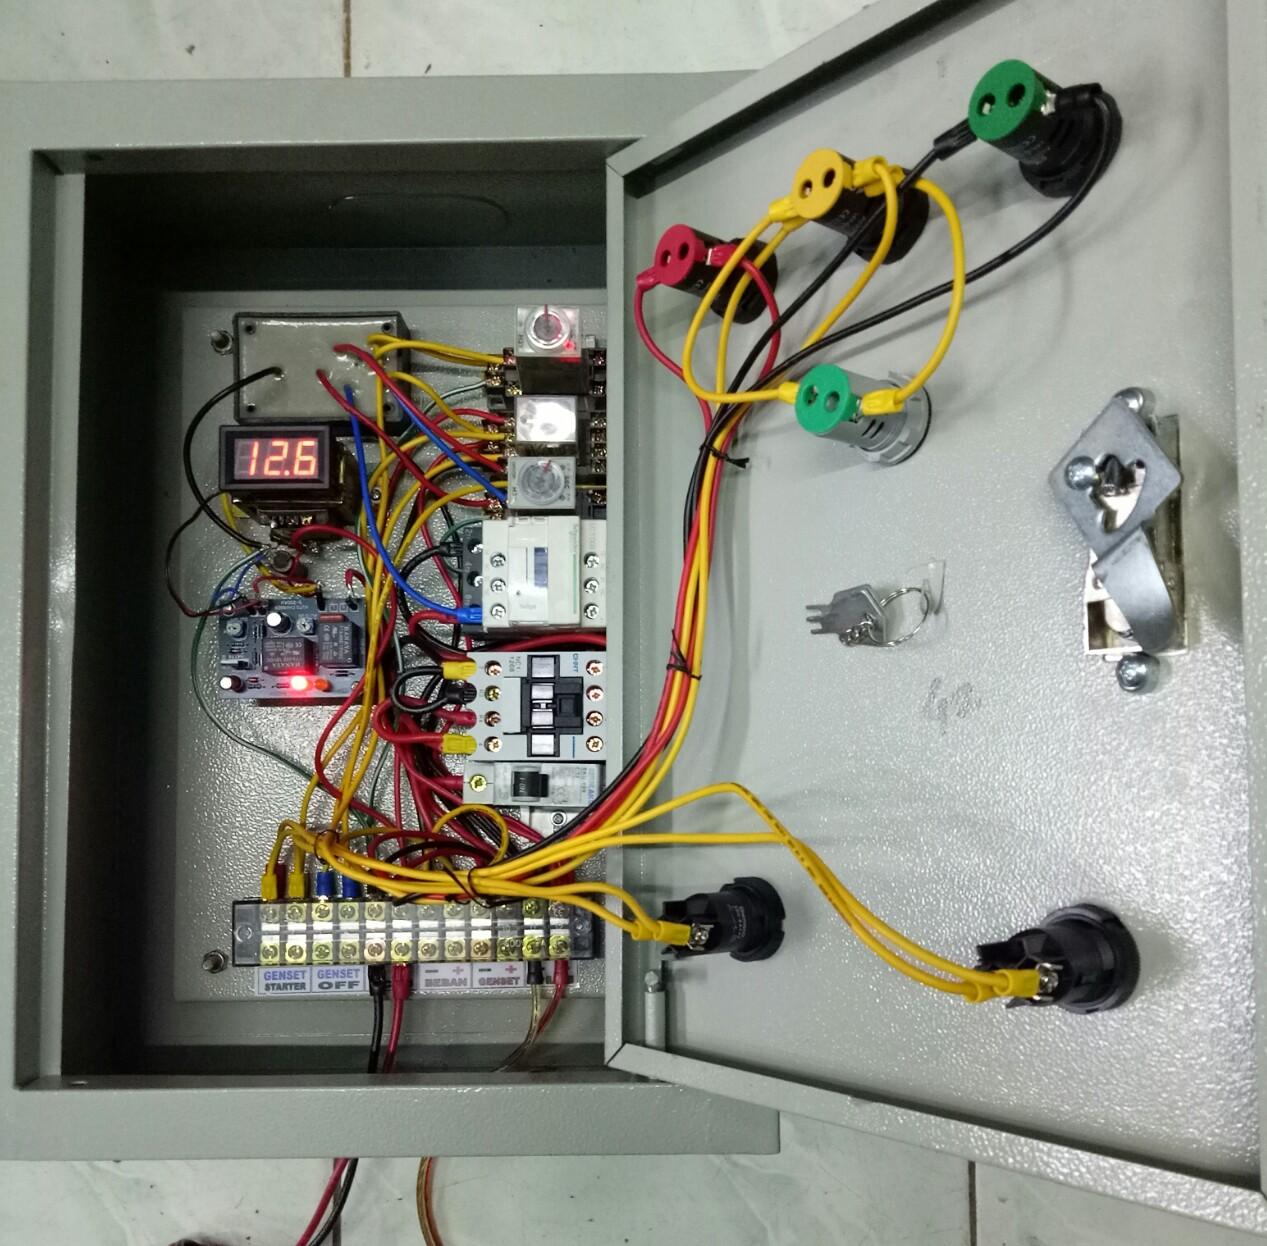 images?q=tbn:ANd9GcQh_l3eQ5xwiPy07kGEXjmjgmBKBRB7H2mRxCGhv1tFWg5c_mWT Rangkaian Wiring Diagram Ats Amf Genset